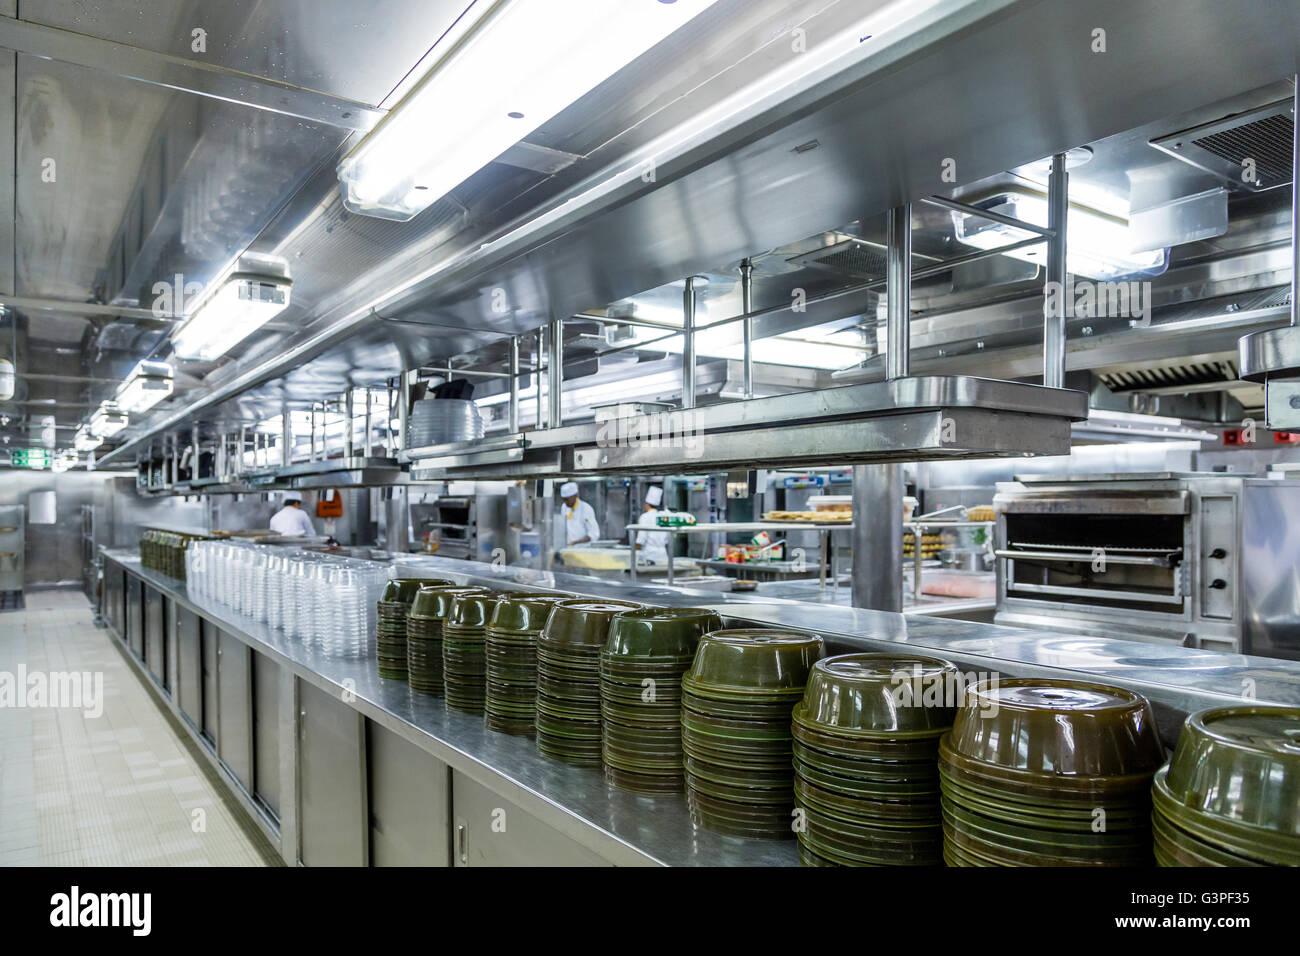 Empty Commercial Kitchen In Restaurant Stock Photos & Empty ...